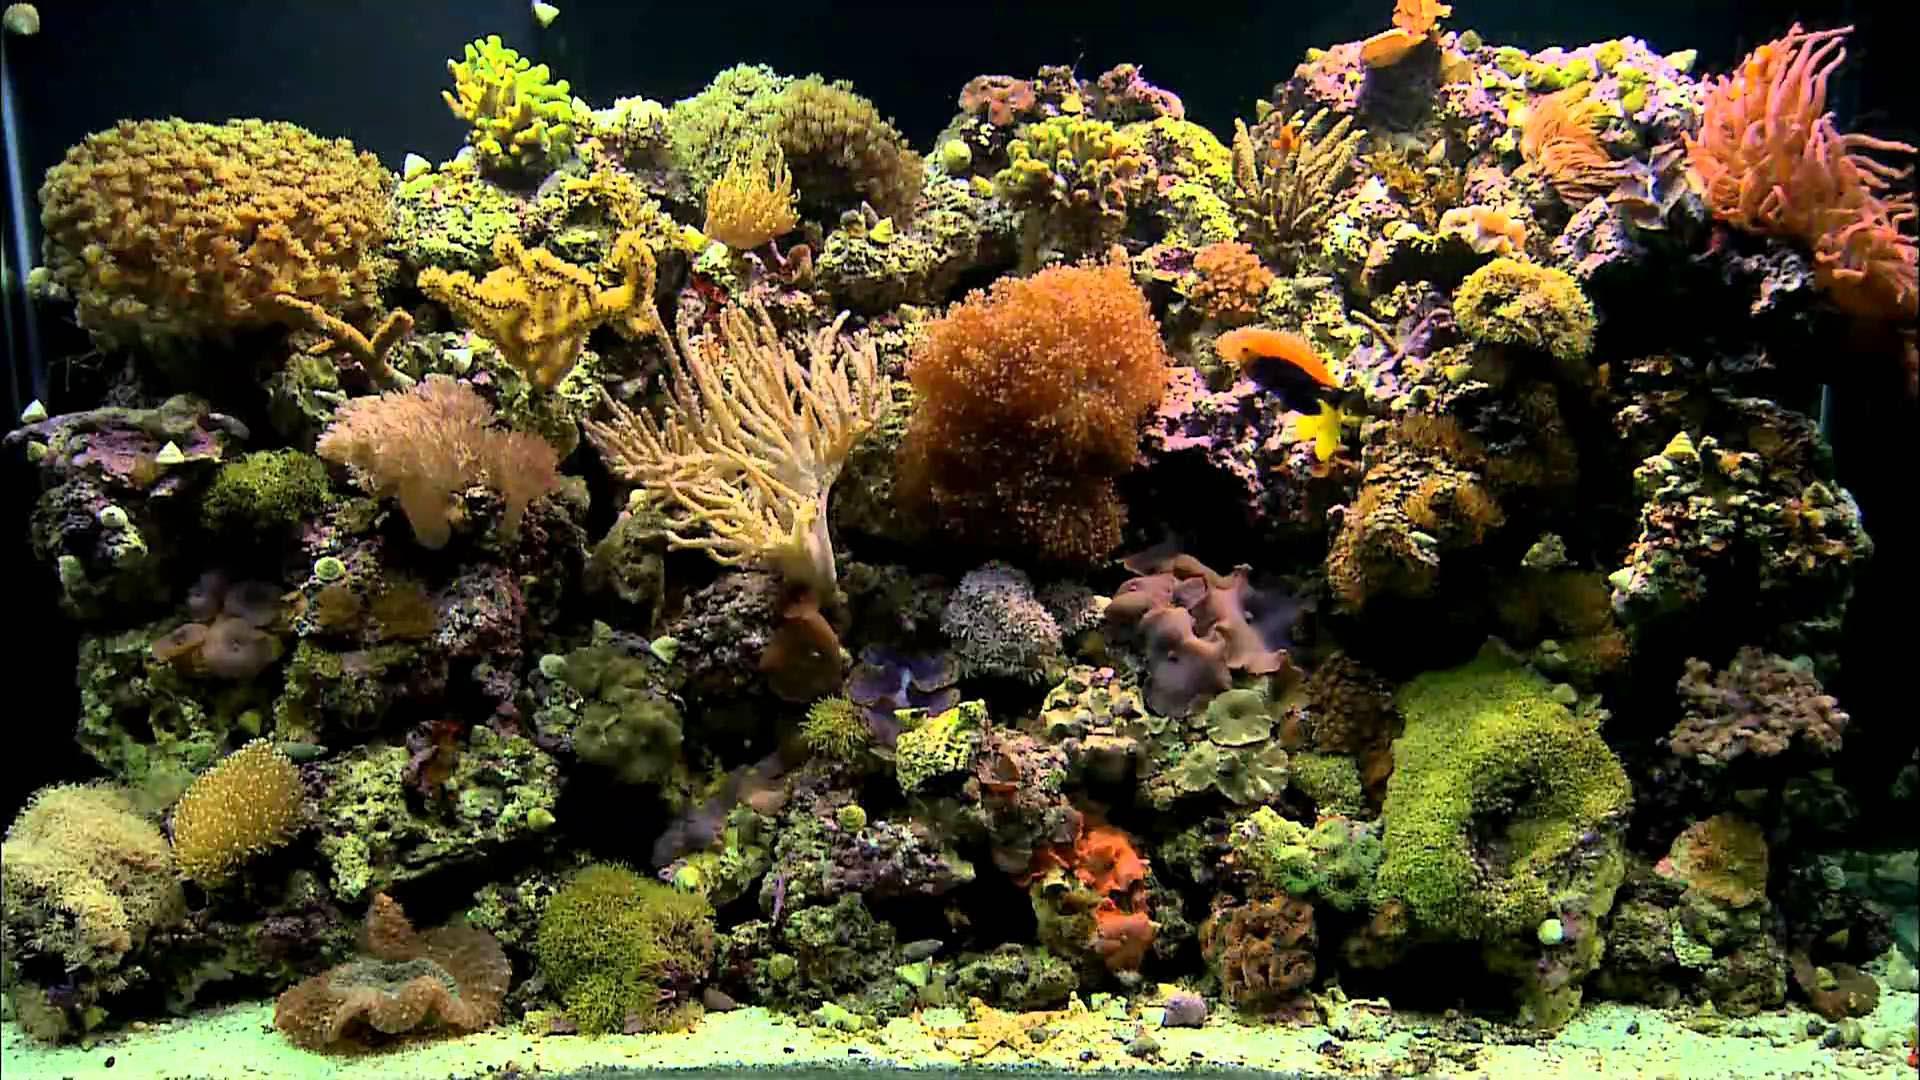 decoration aquarium tissue you decor box coral need do ltr aqu what